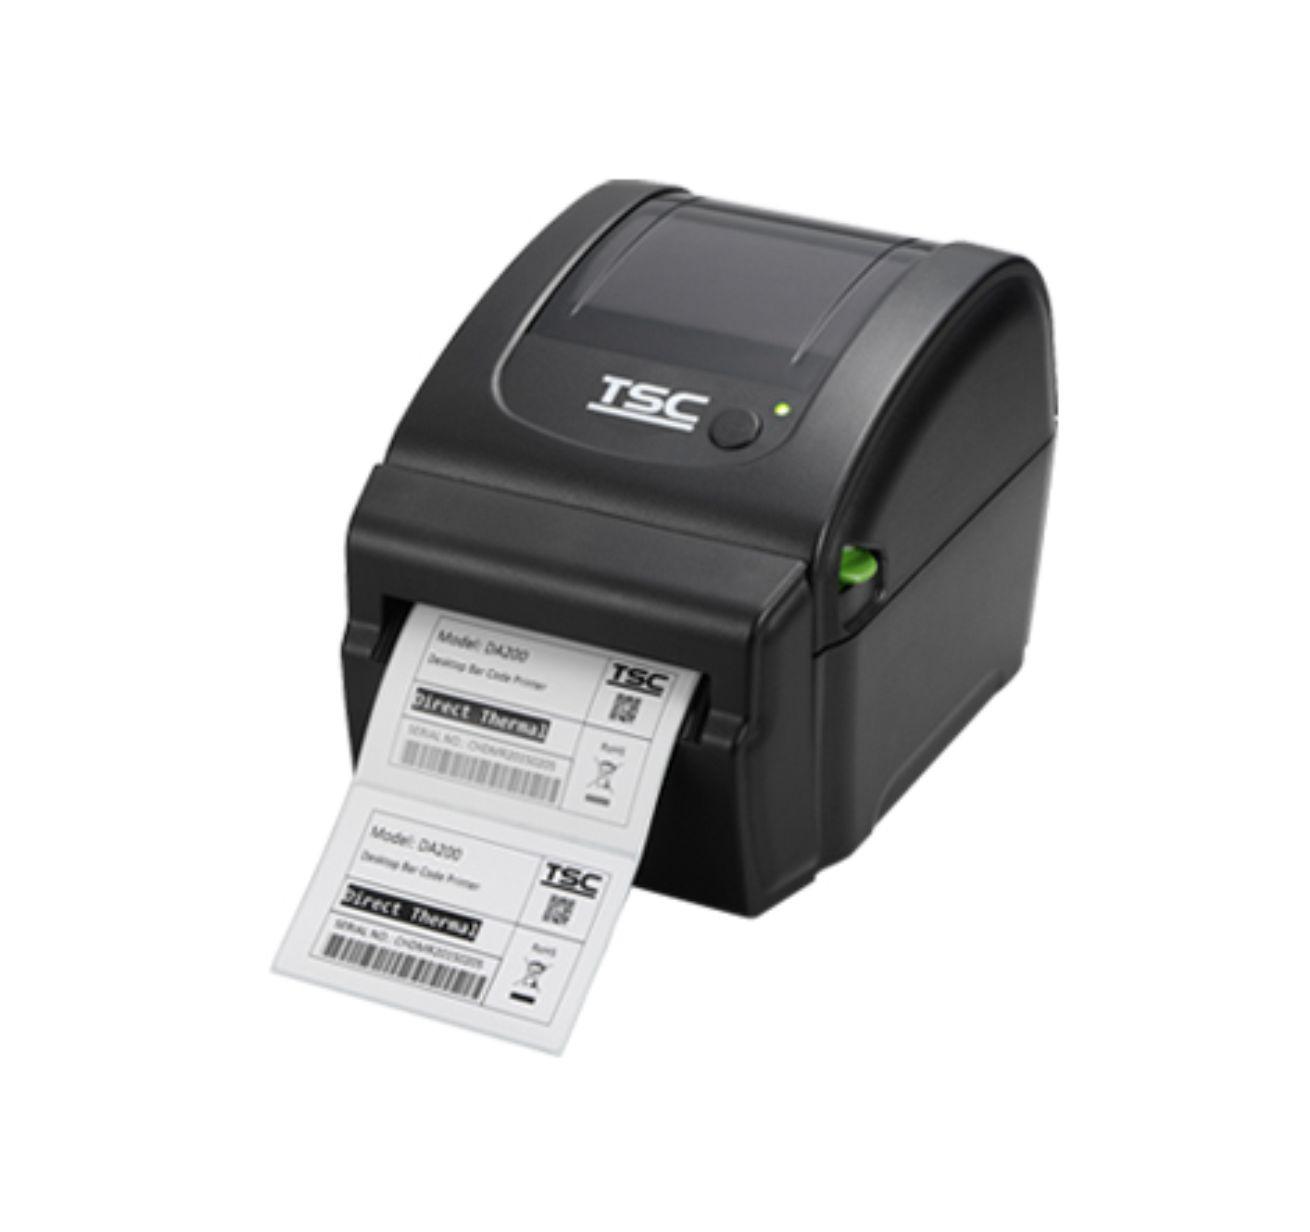 TSC DA210 termoprinter